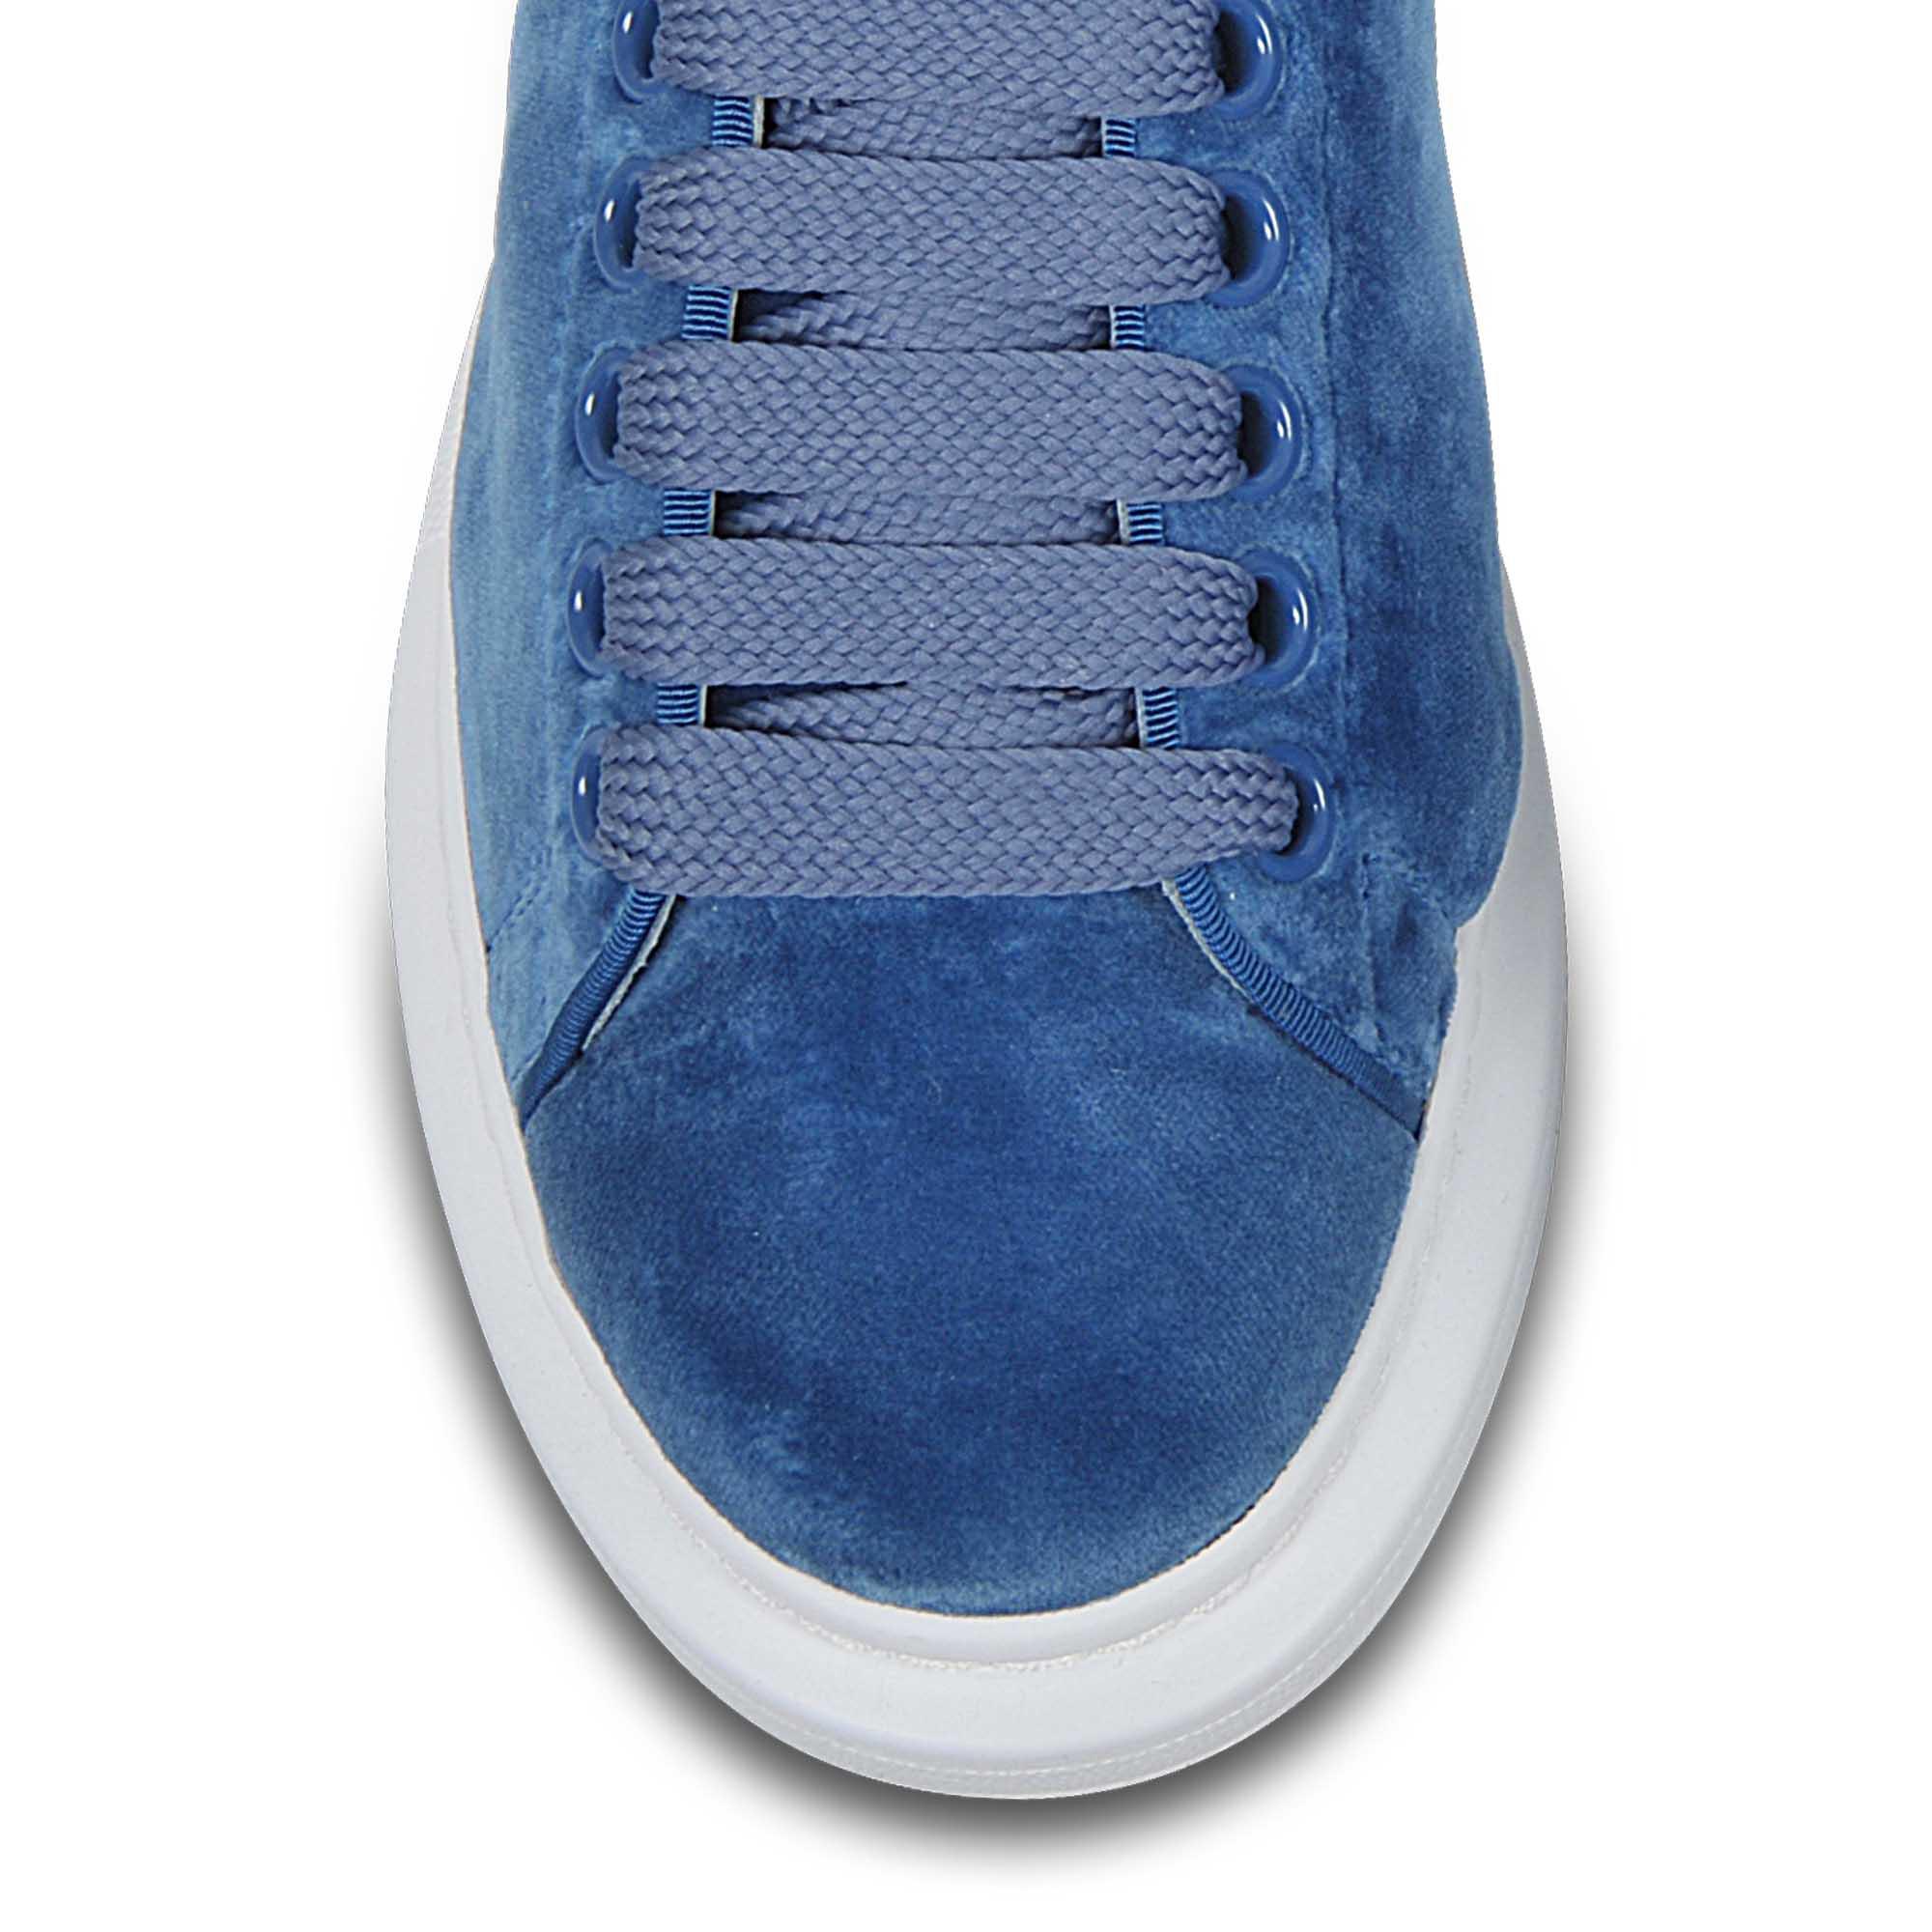 Alexander McQueen Velvet Sneakers in Blue - Lyst 79bb1d69fd